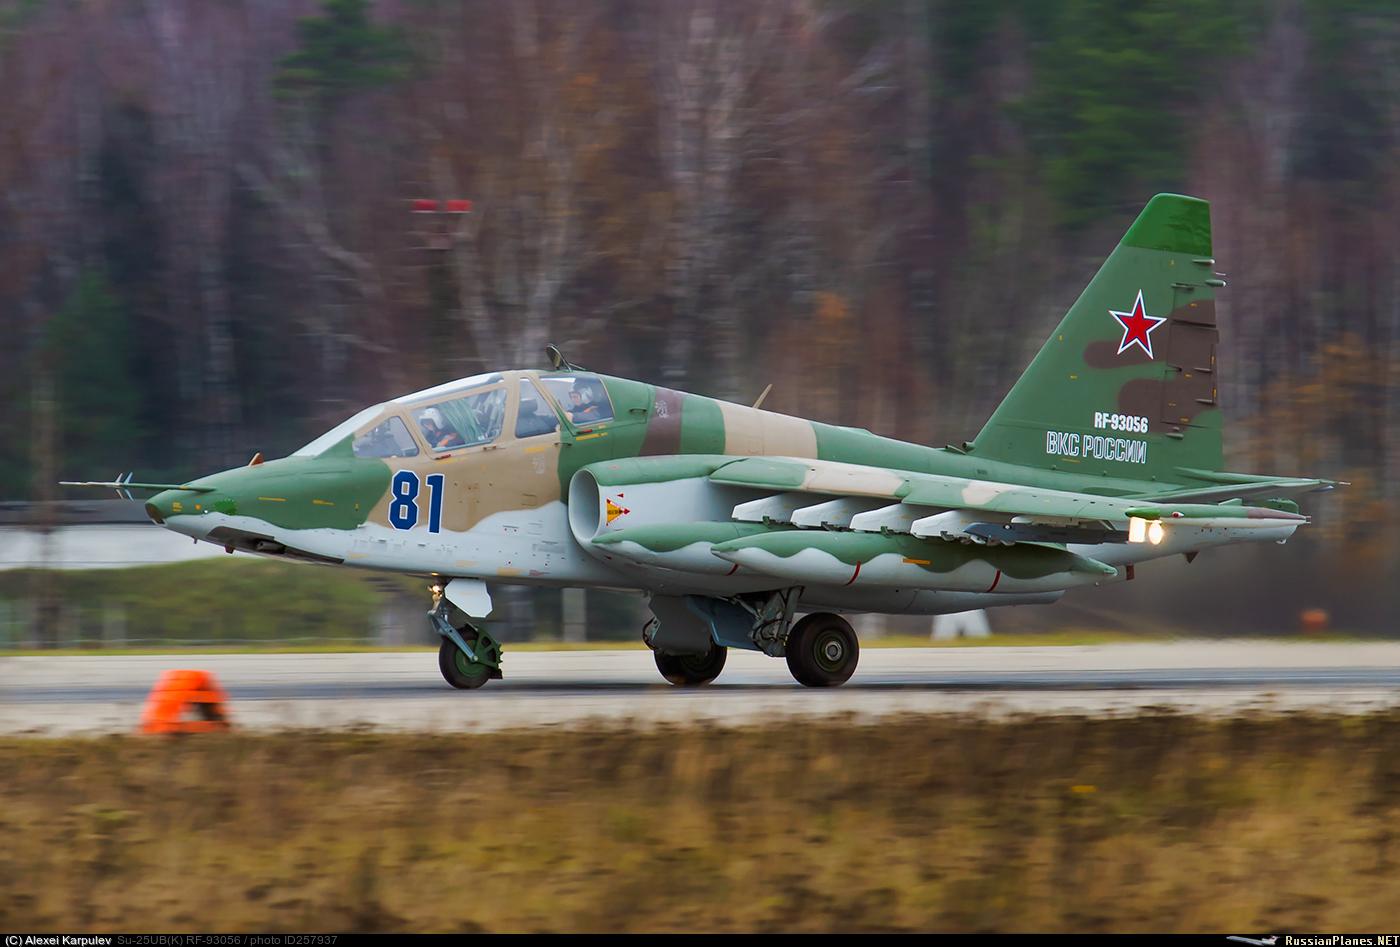 https://russianplanes.net/images/to258000/257937.jpg